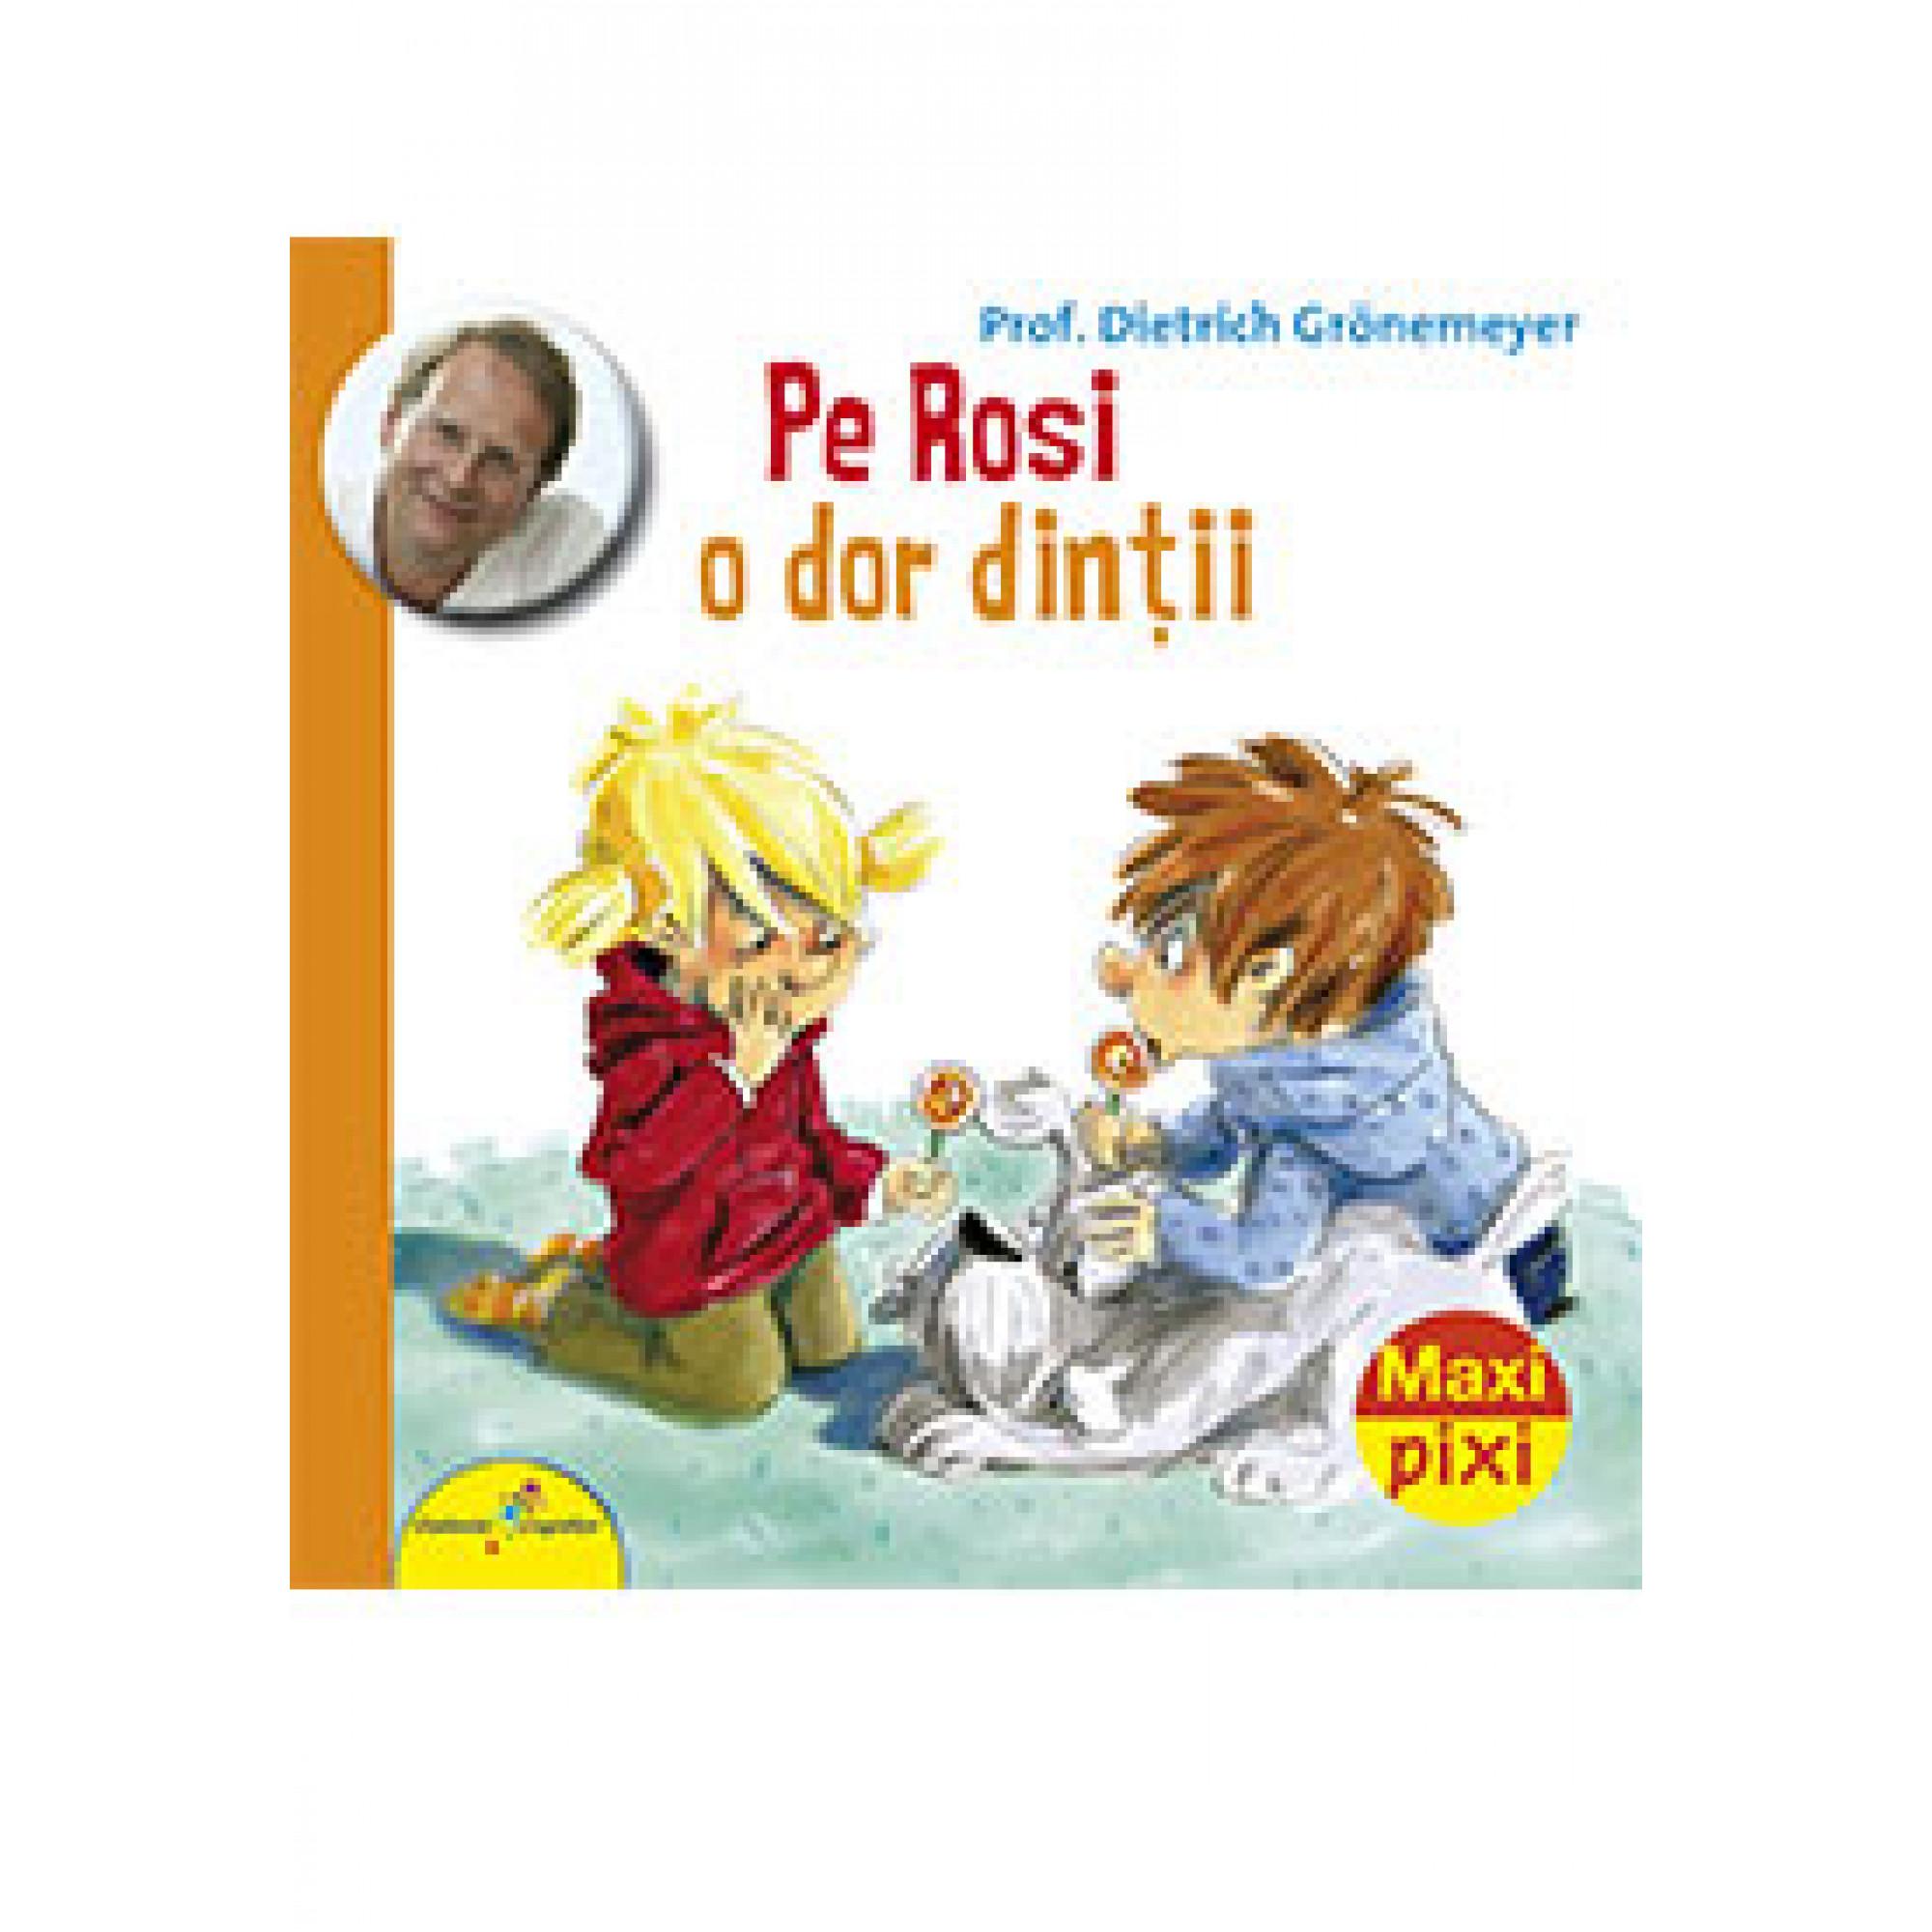 Pe Rosi o dor dinții. Maxi Pixi; Prof. Dietrich Grönemeyer